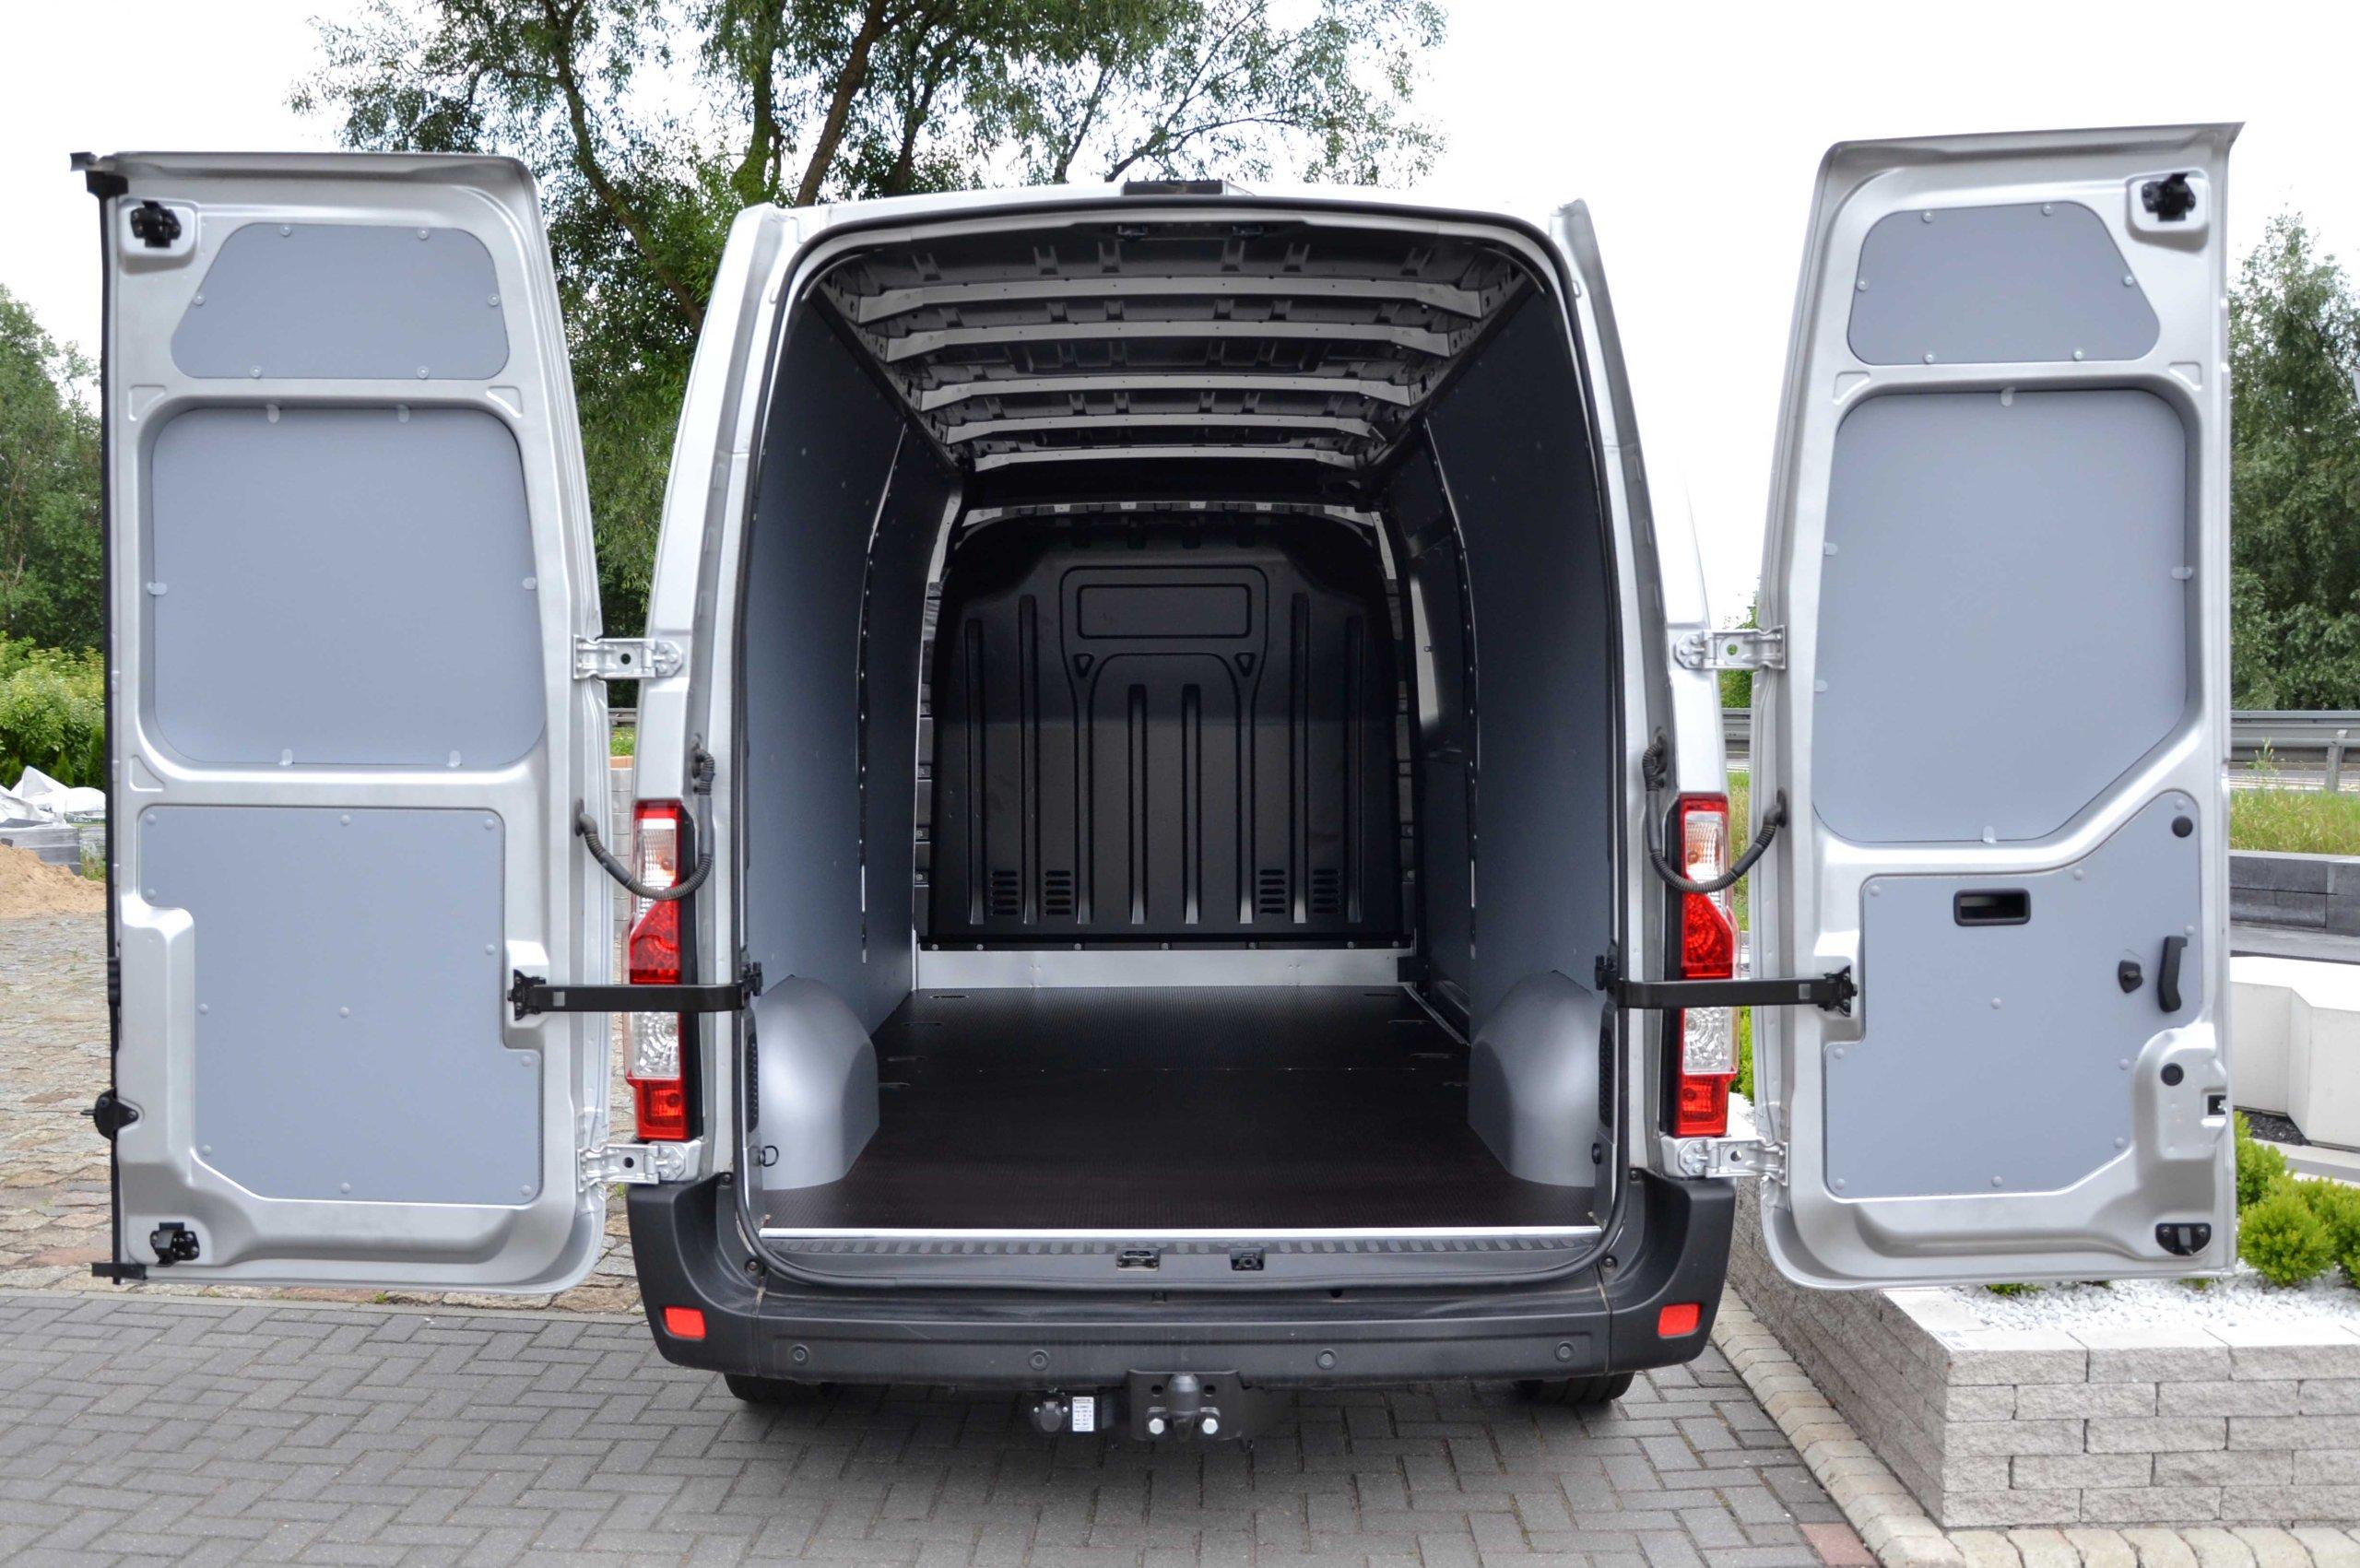 Peugeot Bipper Zabudowa Auta Dostawczego Sklejka 7101737091